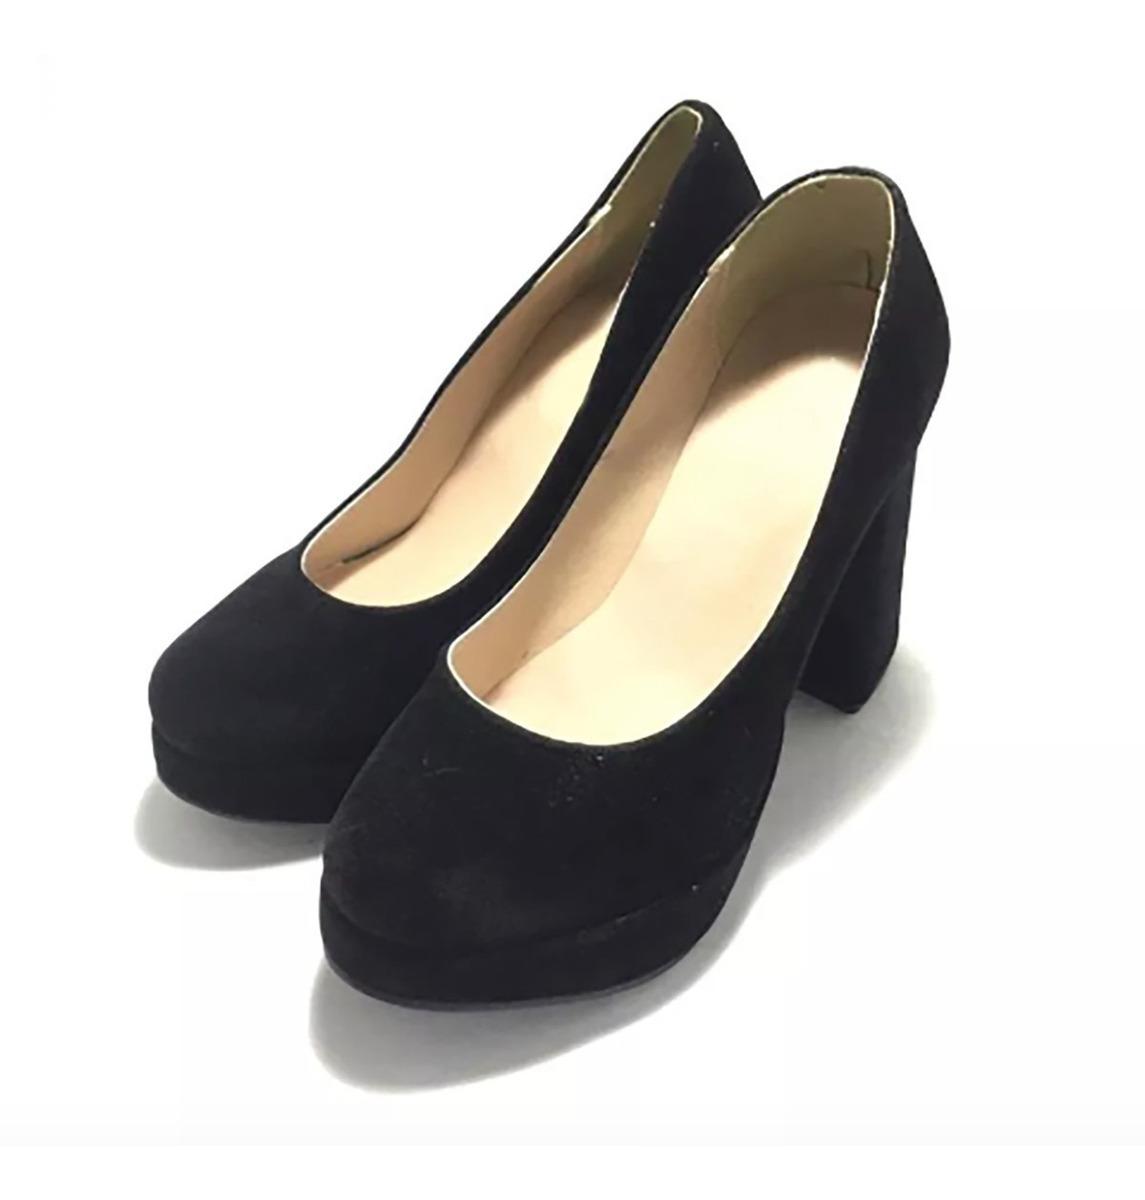 Zapatos Gratis Nude Mujer Val4502 Negros Gamuza Envio cTlFK1J3